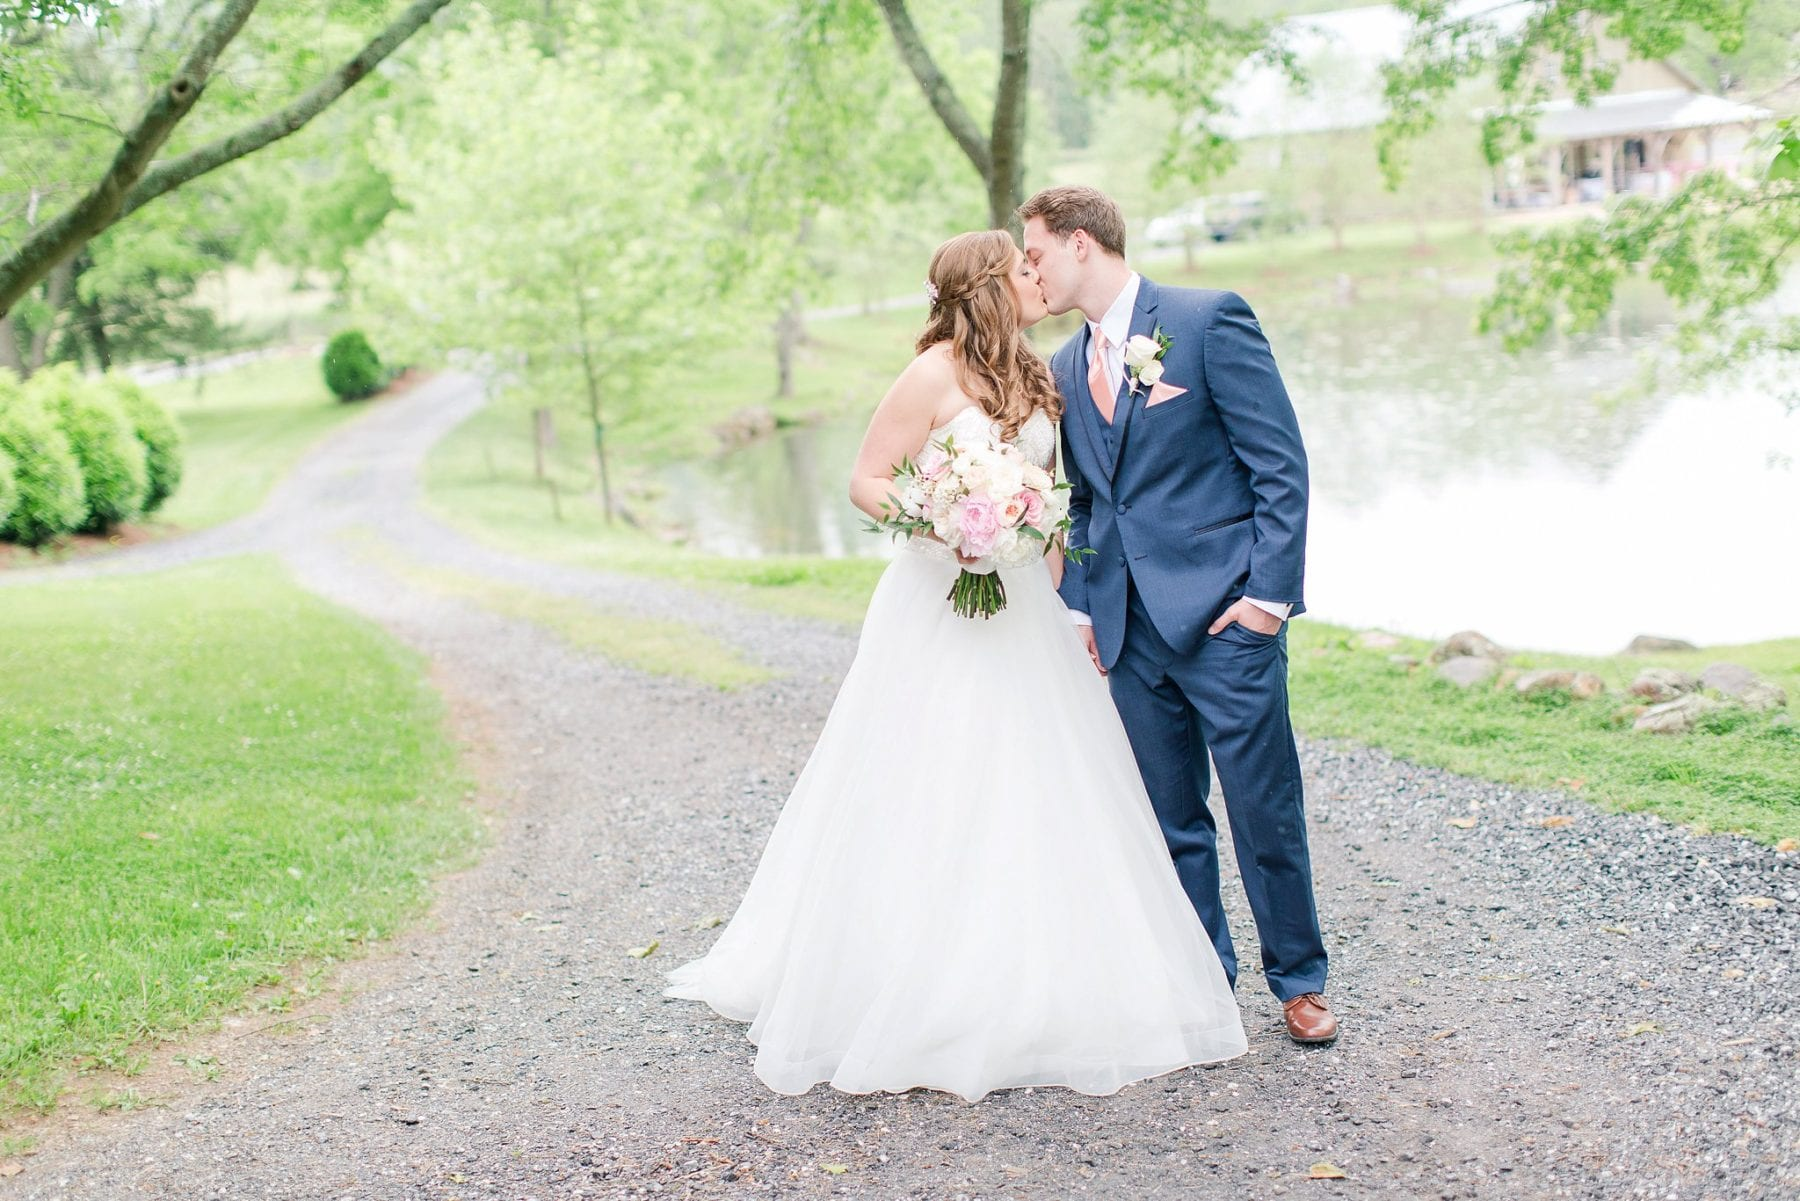 Justin & Megan Big Spring Farm Wedding Photos-122.jpg